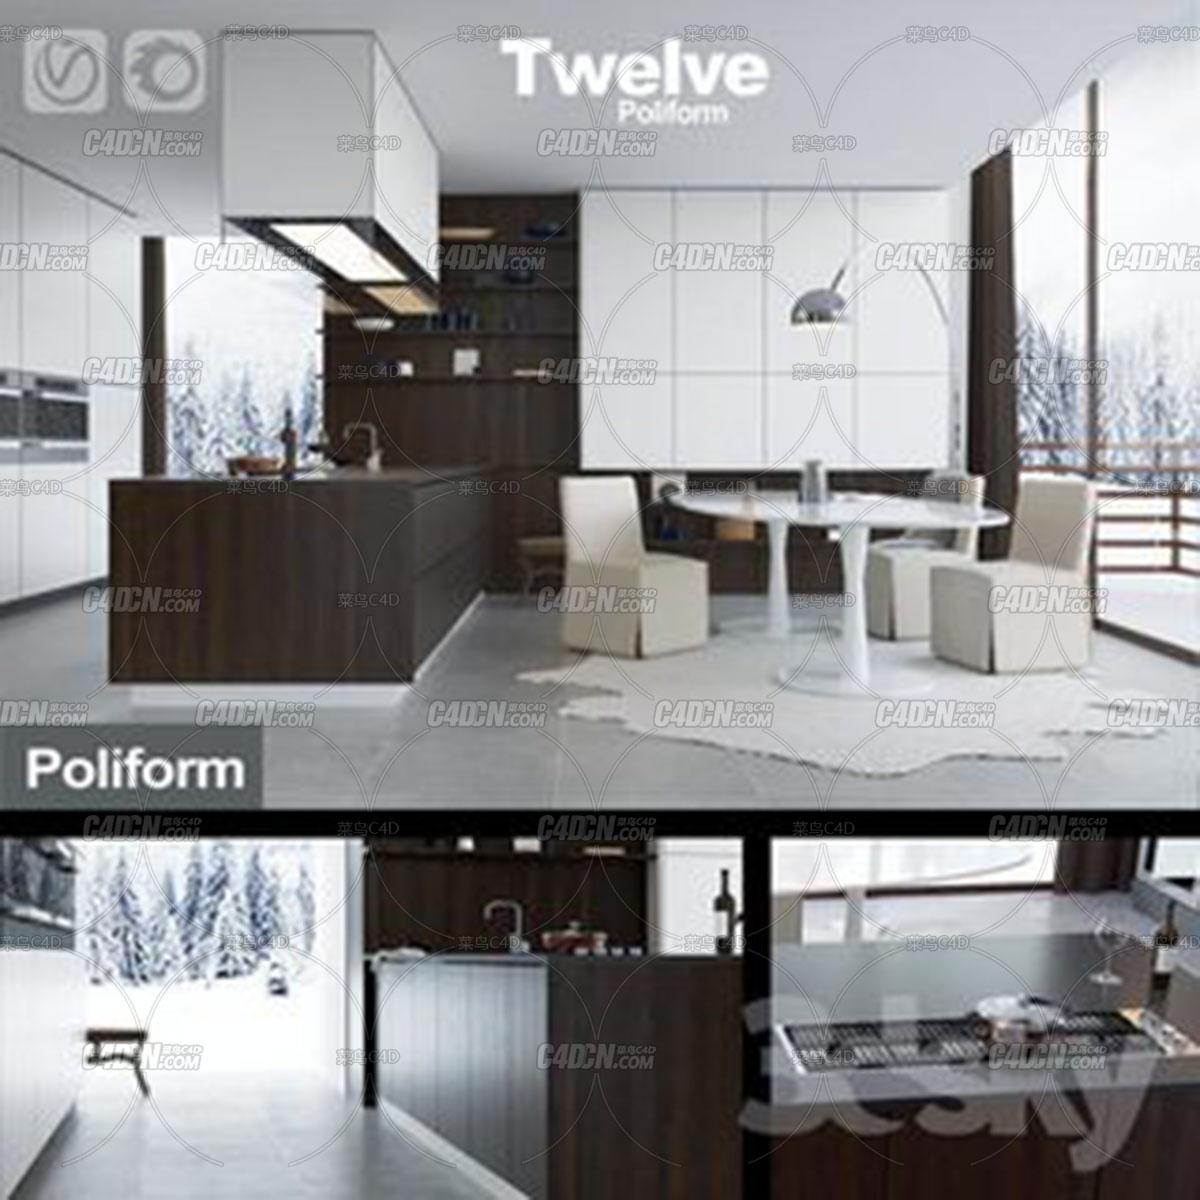 3DSky模型 12套现代化厨房室内工程模型合集